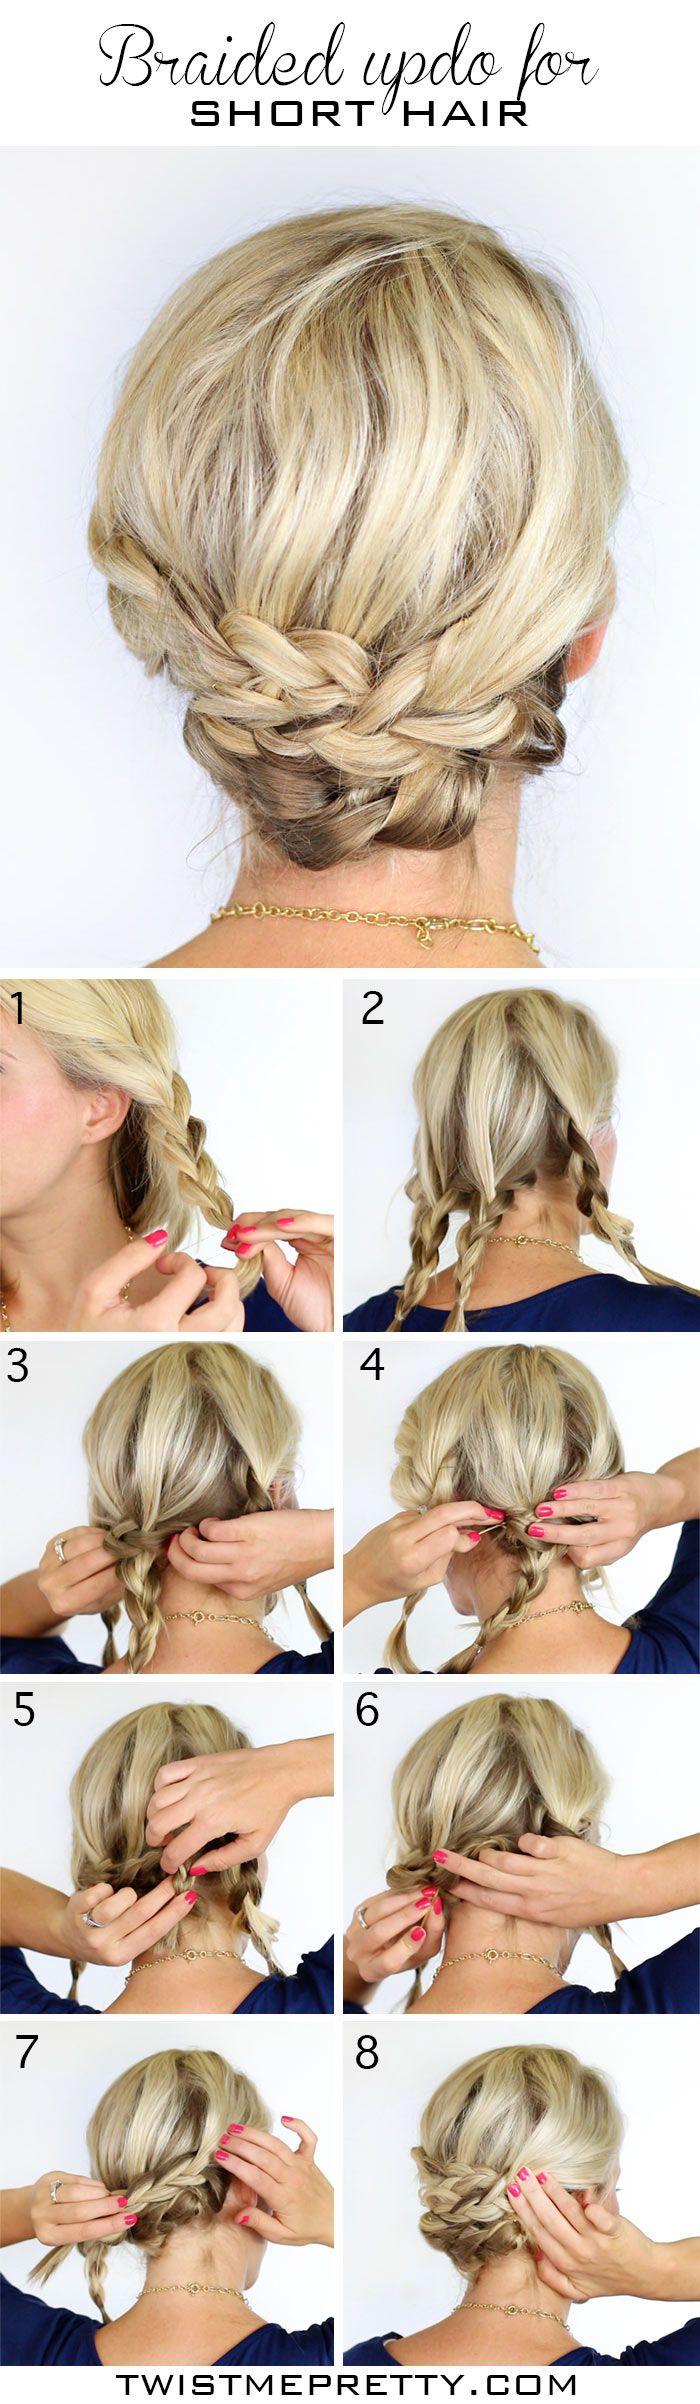 Enjoyable 1000 Ideas About Braid Short Hair On Pinterest Highlighted Hair Short Hairstyles Gunalazisus